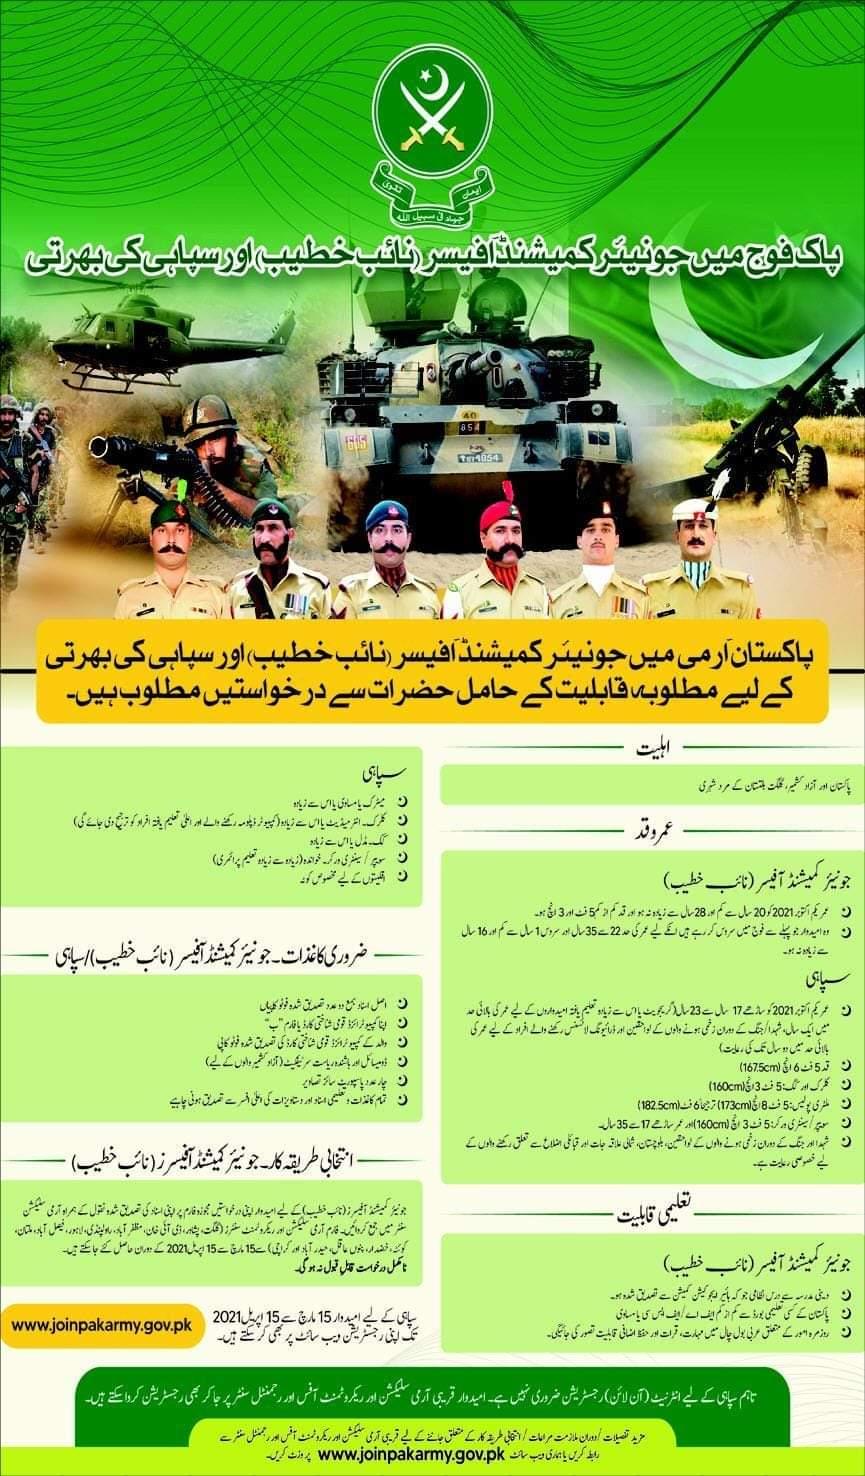 PAK Army jobs 2021|latest Army jobs 2021|Pakistan Army Jobs 2021|| Online Apply